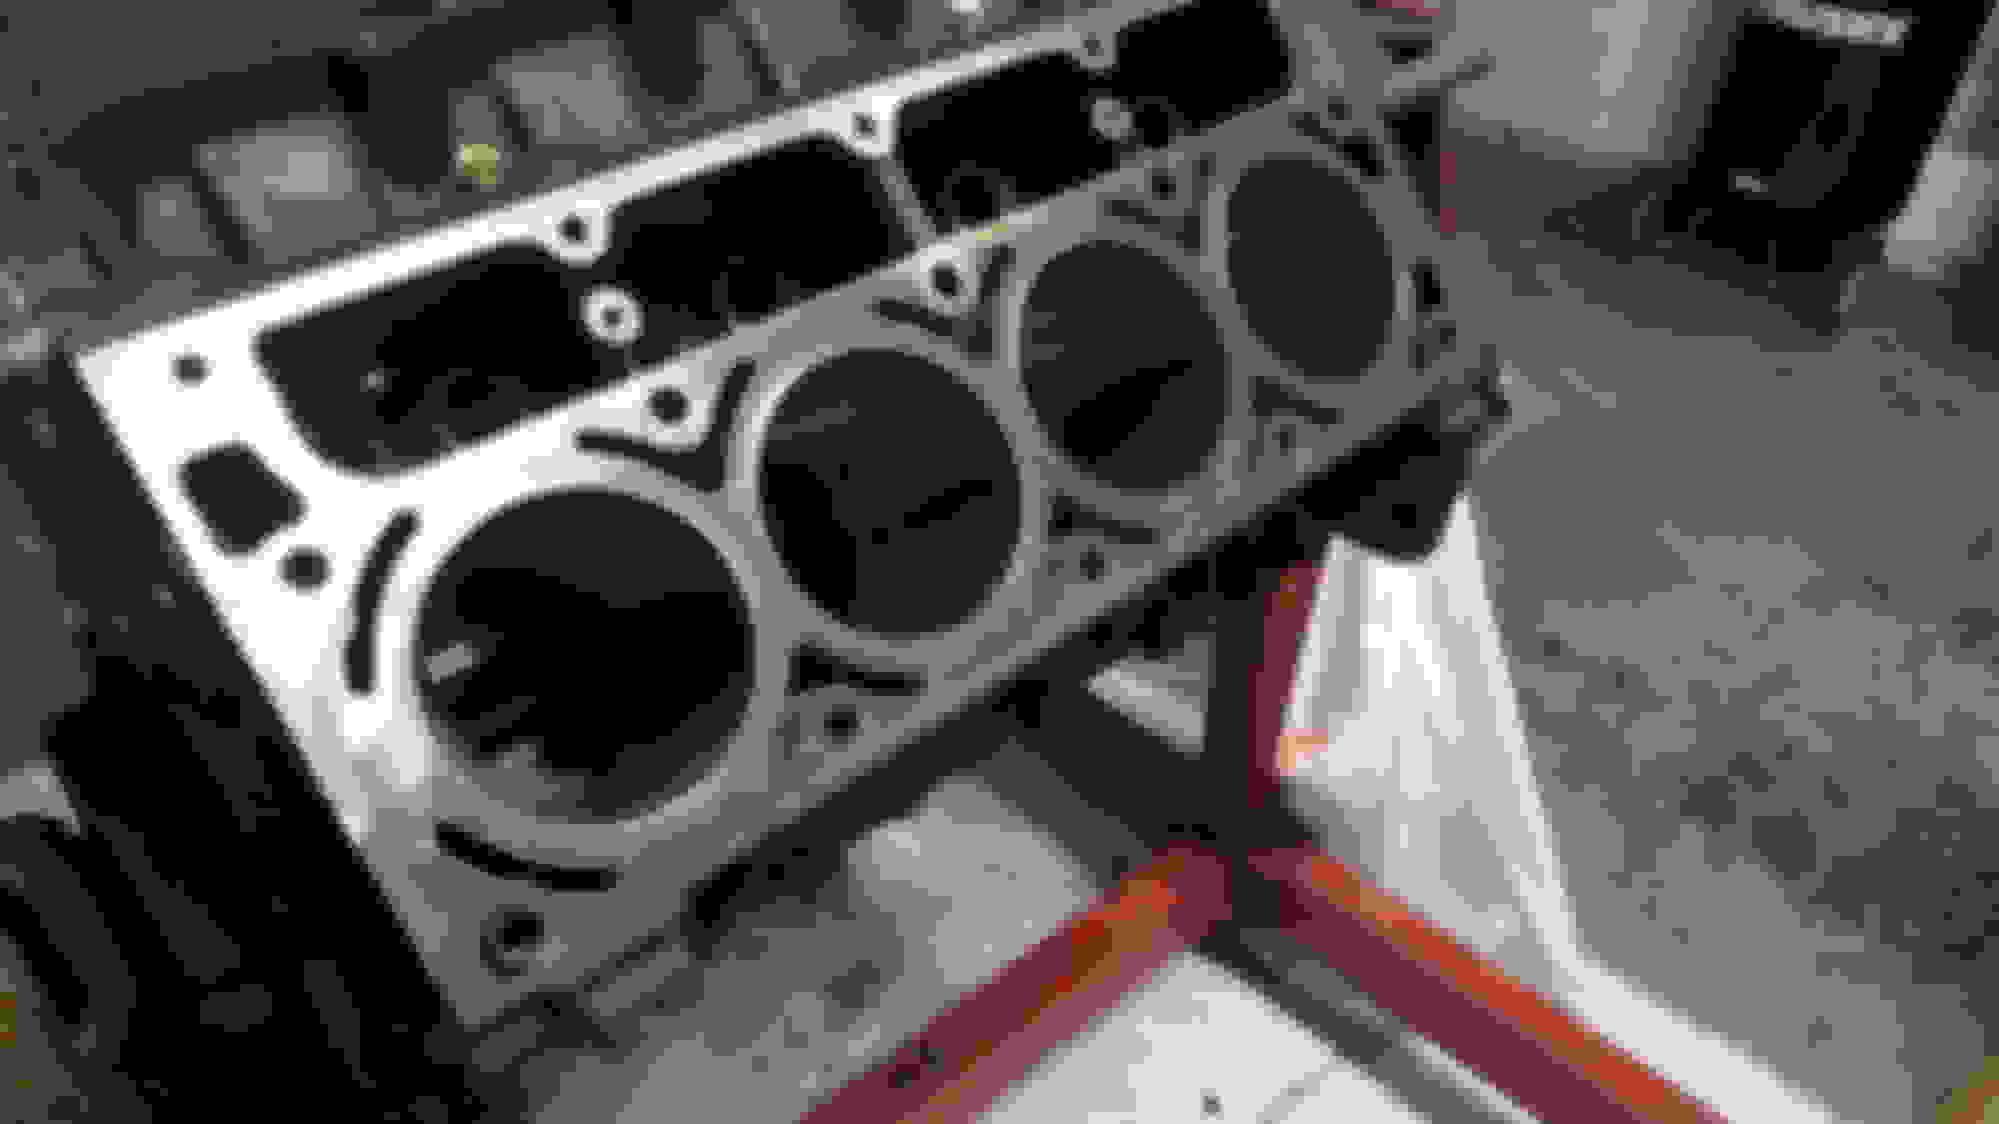 Turbo Megasquirt 4 8 Swap - Third Generation F-Body Message Boards